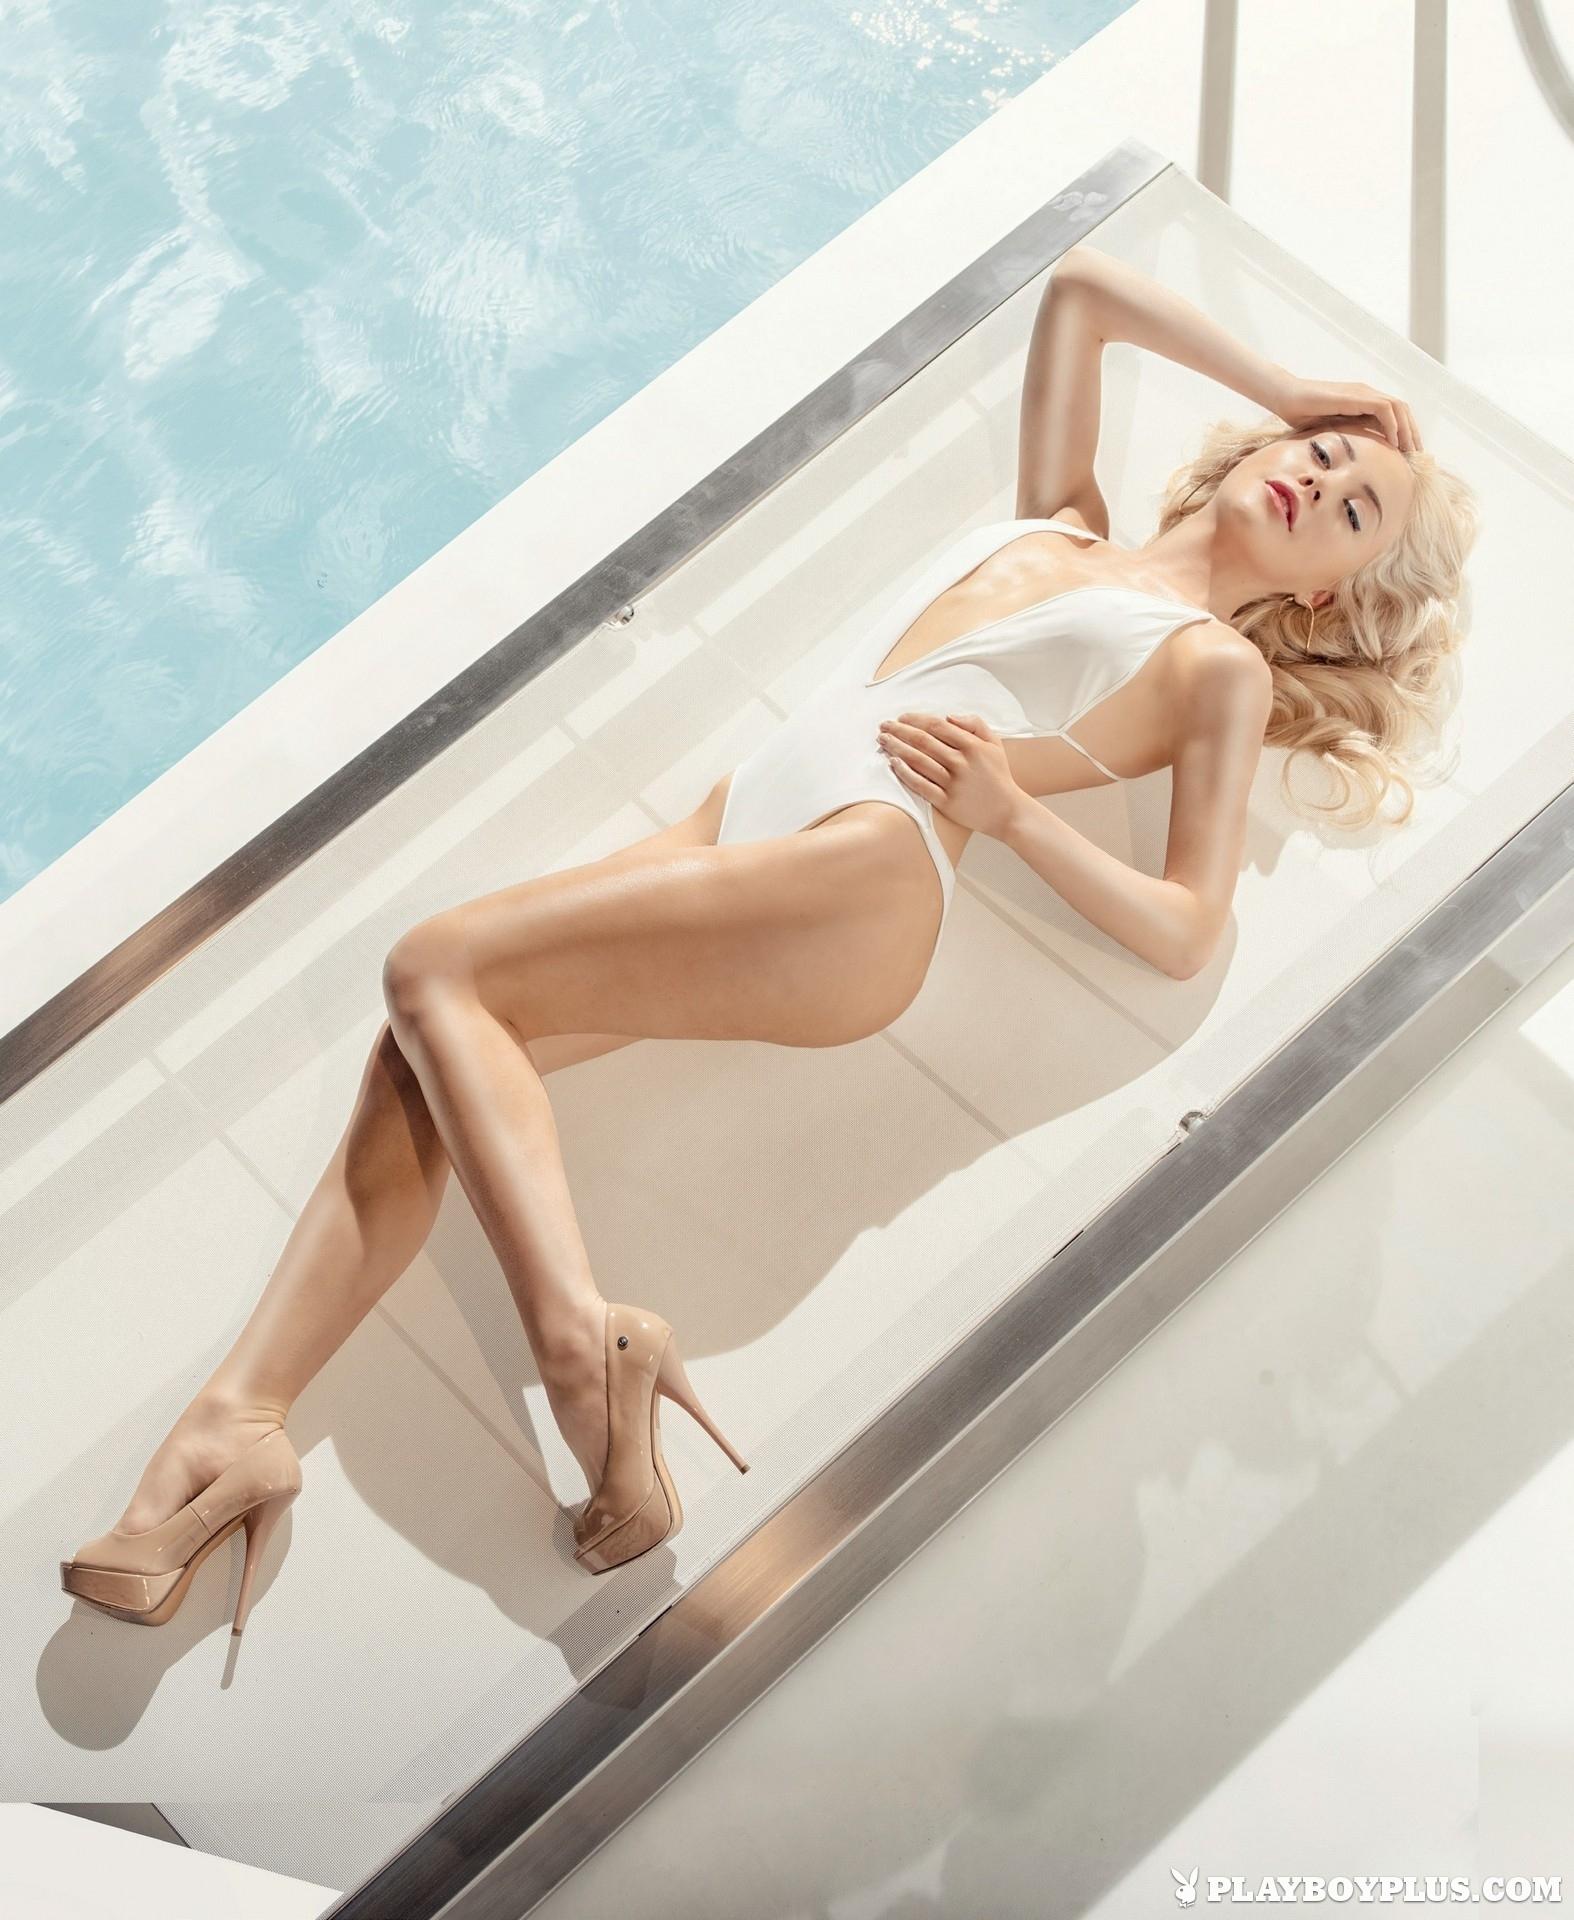 amber-bassick-blonde-nude-underwater-playboy-03